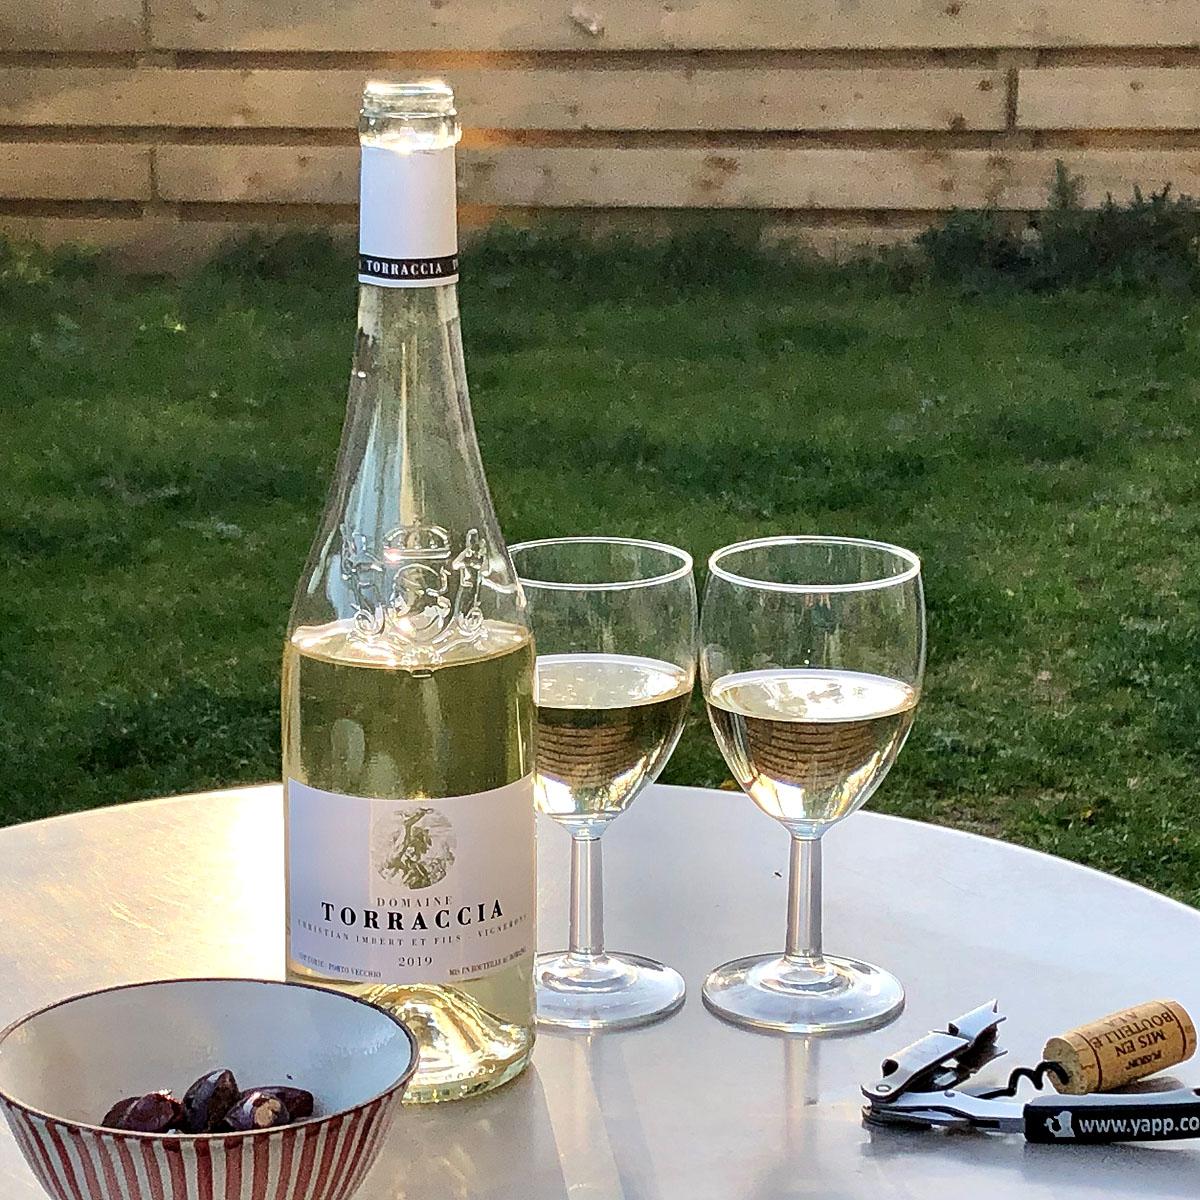 Vin de Corse Porto Vecchio: Domaine de Torraccia Blanc 2019 - Lifestyle